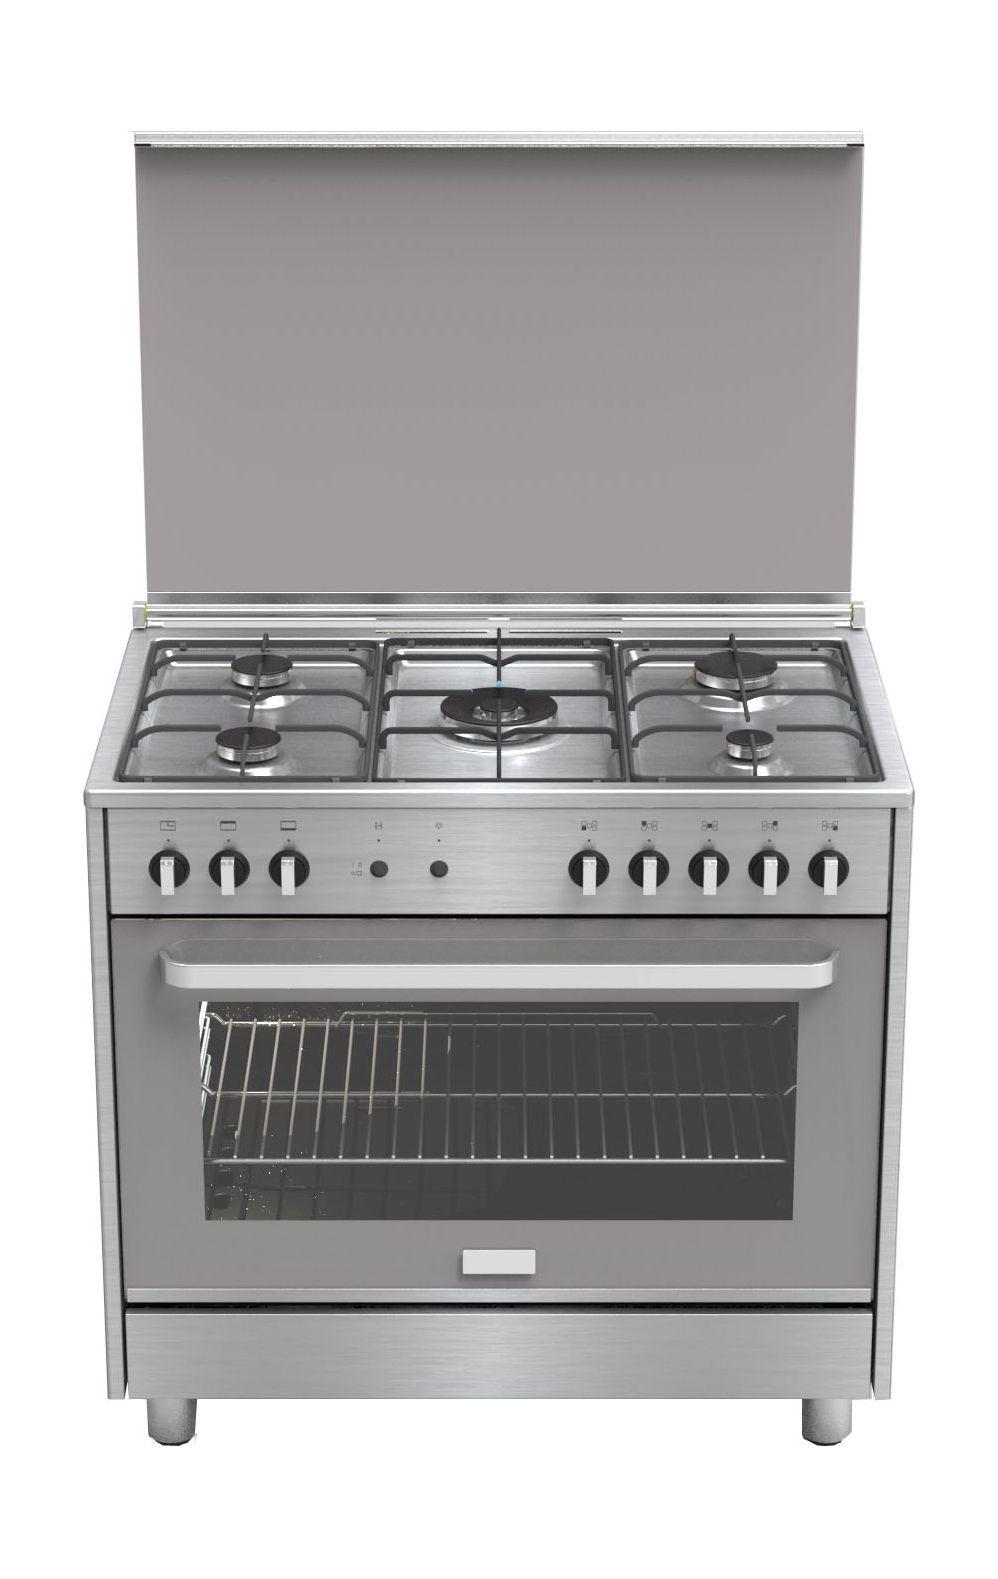 Fs90-sa1 90x60 Cm 5 Quemador De Pie Cocina De Gas Acero Inoxidable ...